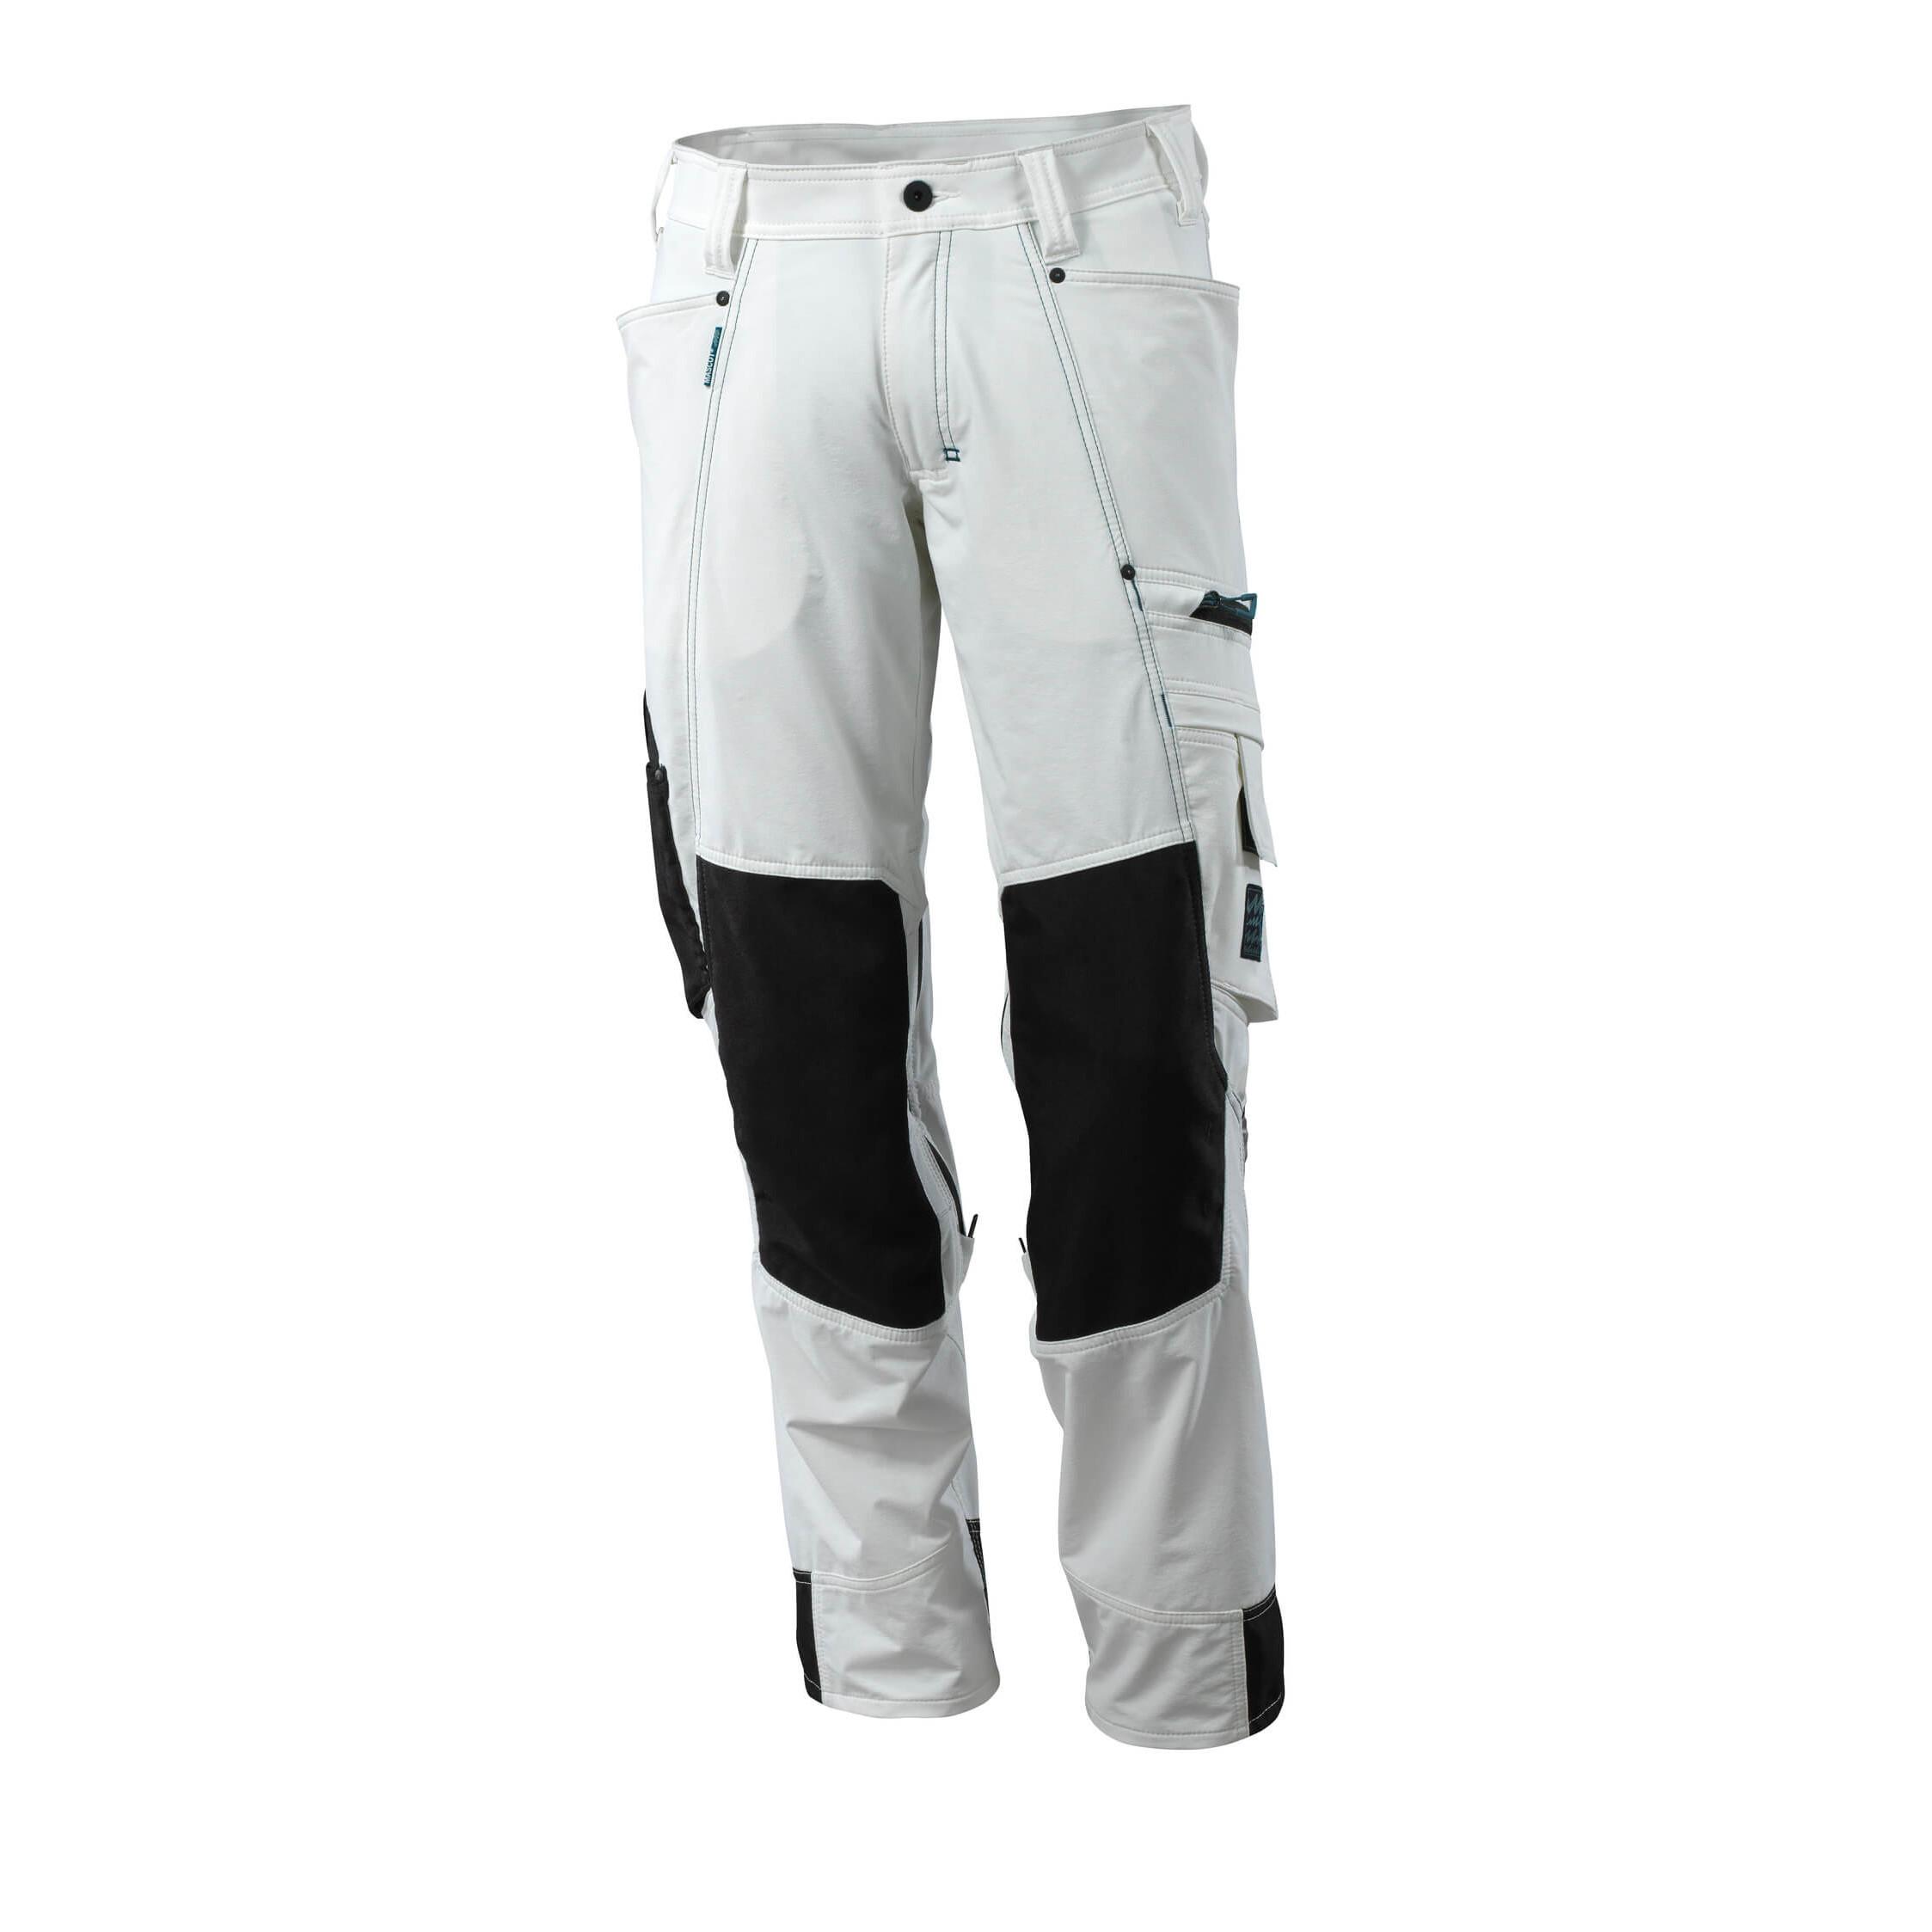 Pracovné nohavice Mascot Advanced biele